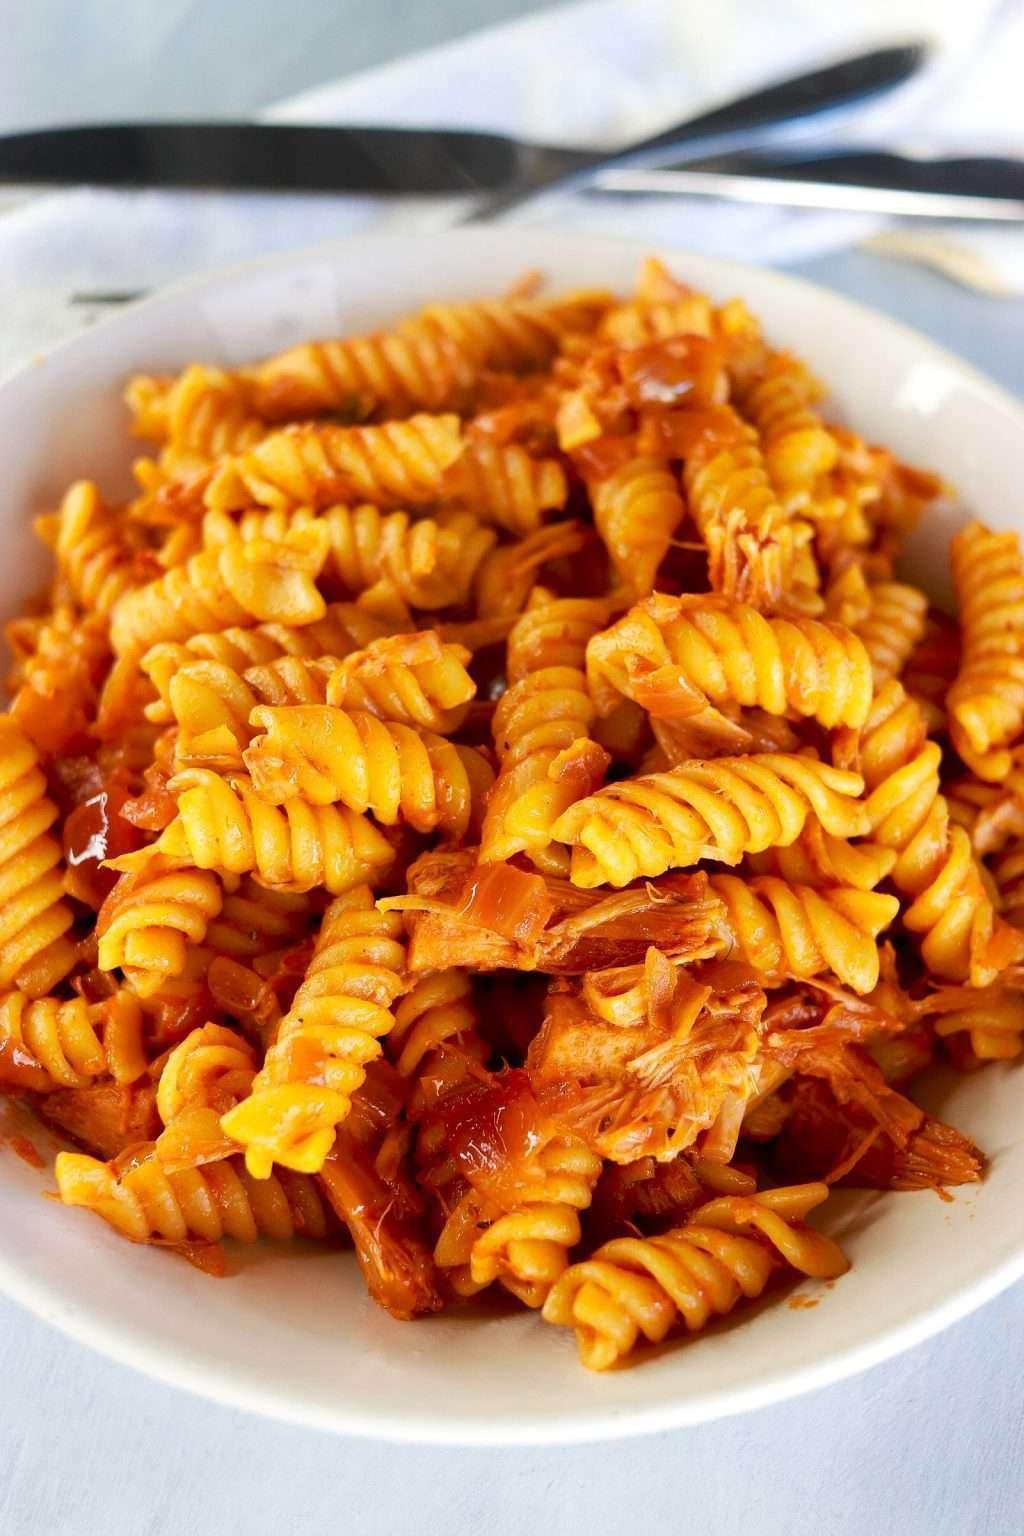 Jackfruit rotini pasta recipe 4190 1024x1536 - Jackfruit Rotini Pasta Recipe: Super Easy & Vegan